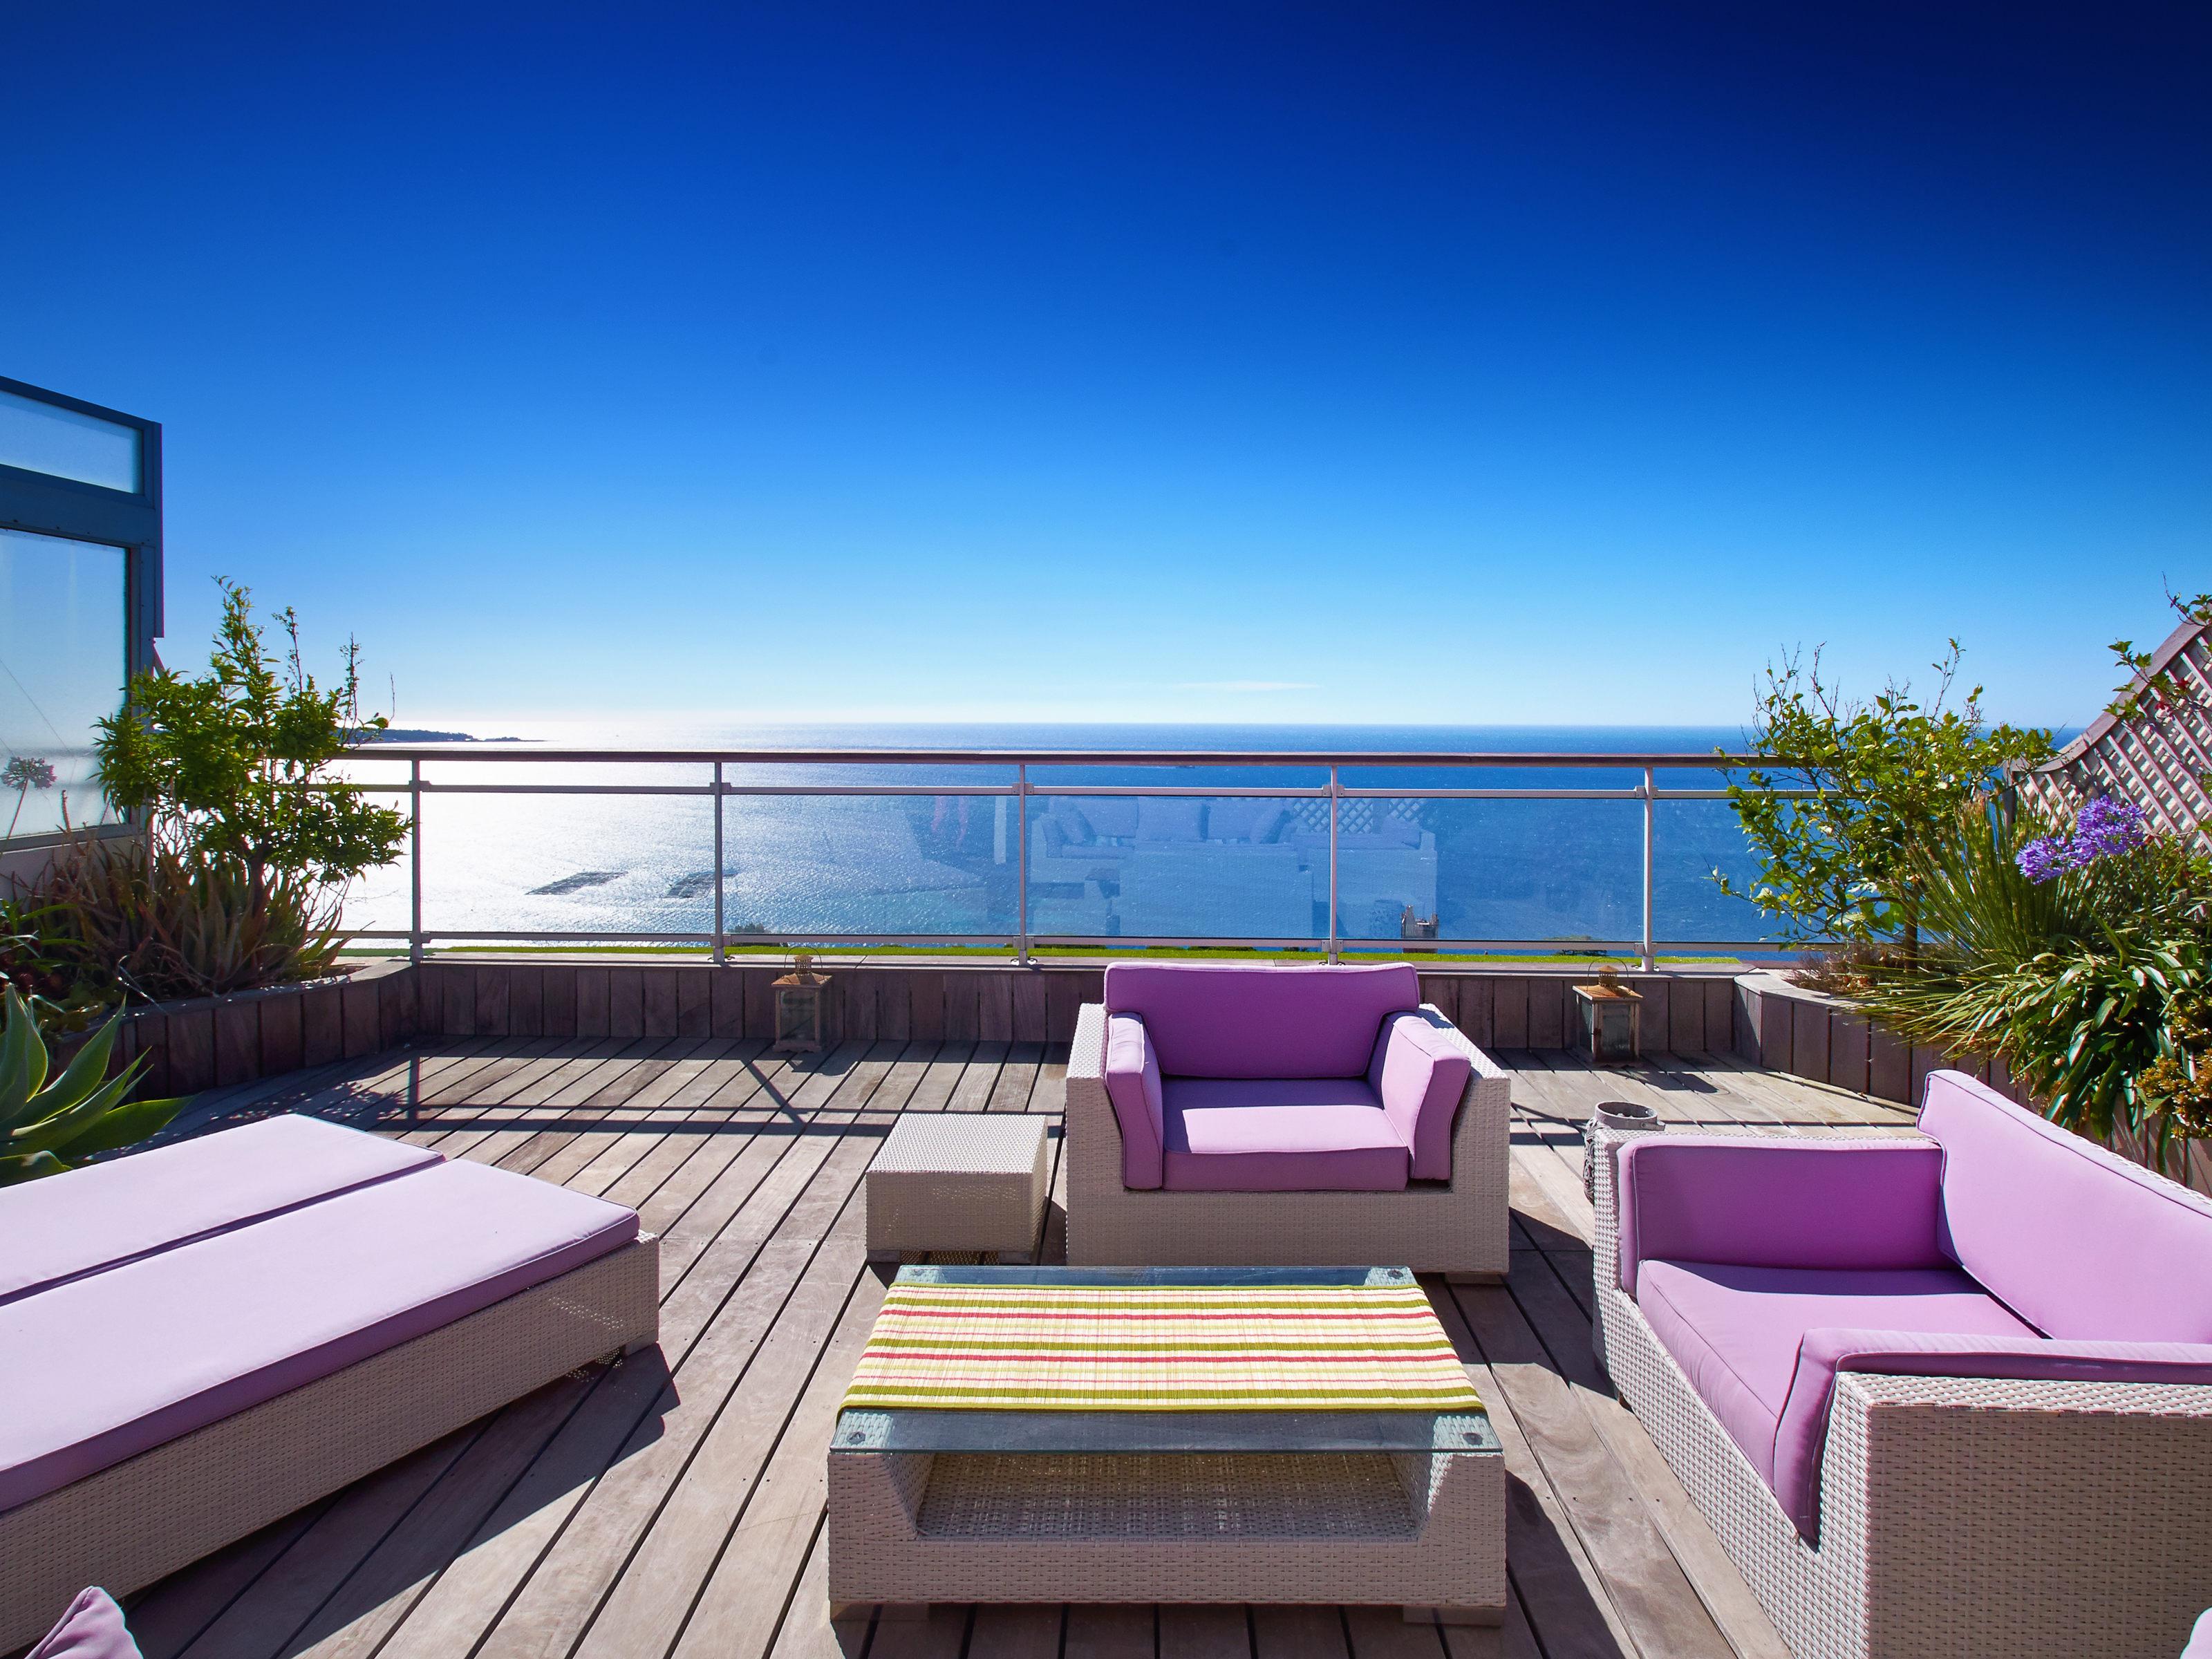 Apartamento por un Venta en Penthouse in Cannes with large terrace and panoramic sea views Cannes, Provincia - Alpes - Costa Azul 06400 Francia